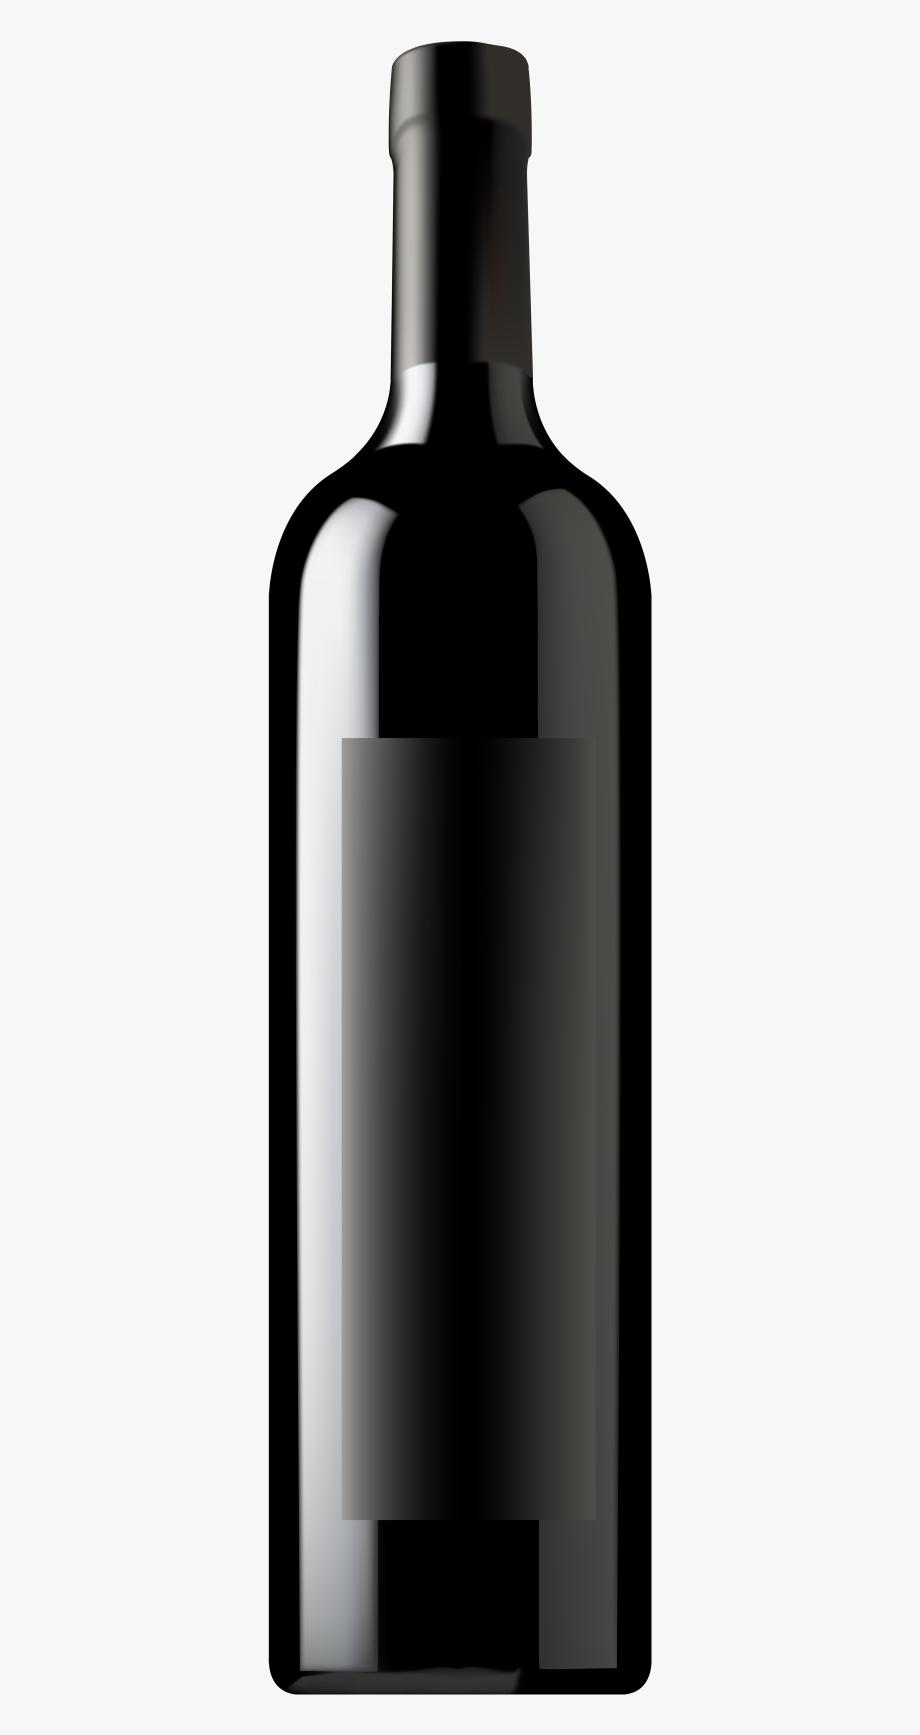 Wine Bottle Png Clip Art Image.